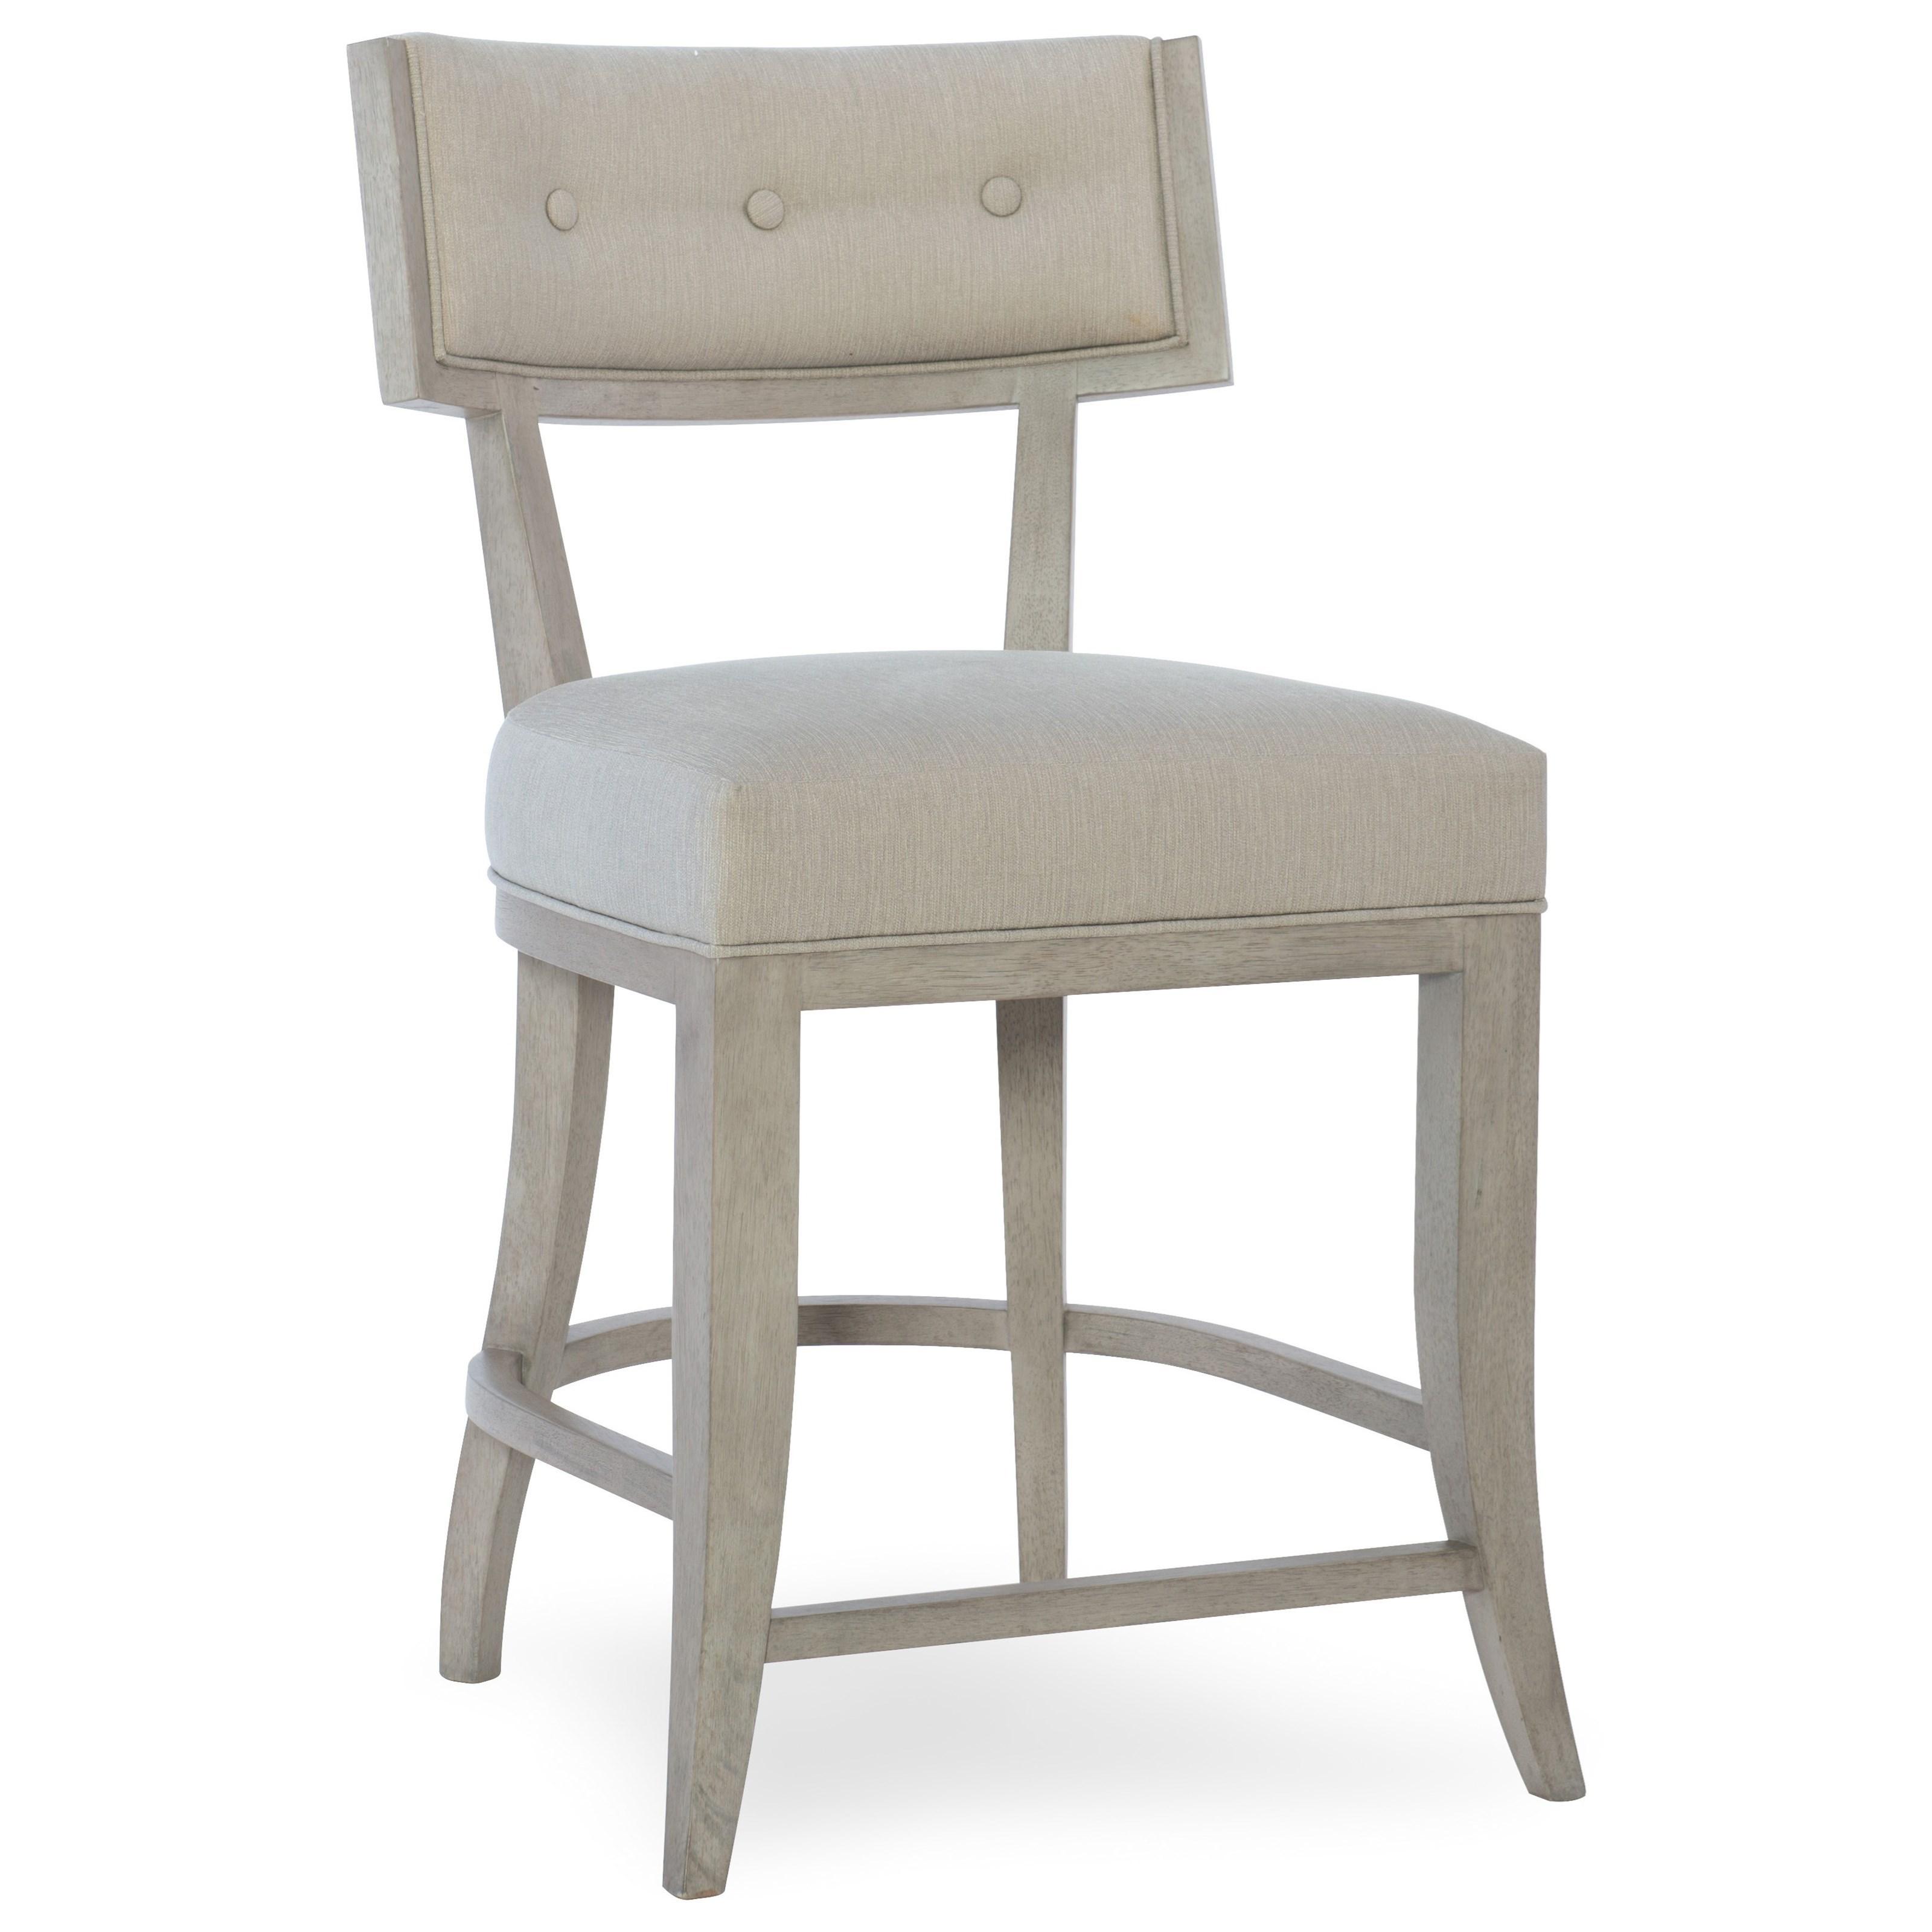 hooker furniture elixir klismos upholstered counter stool baeru0027s furniture bar stools